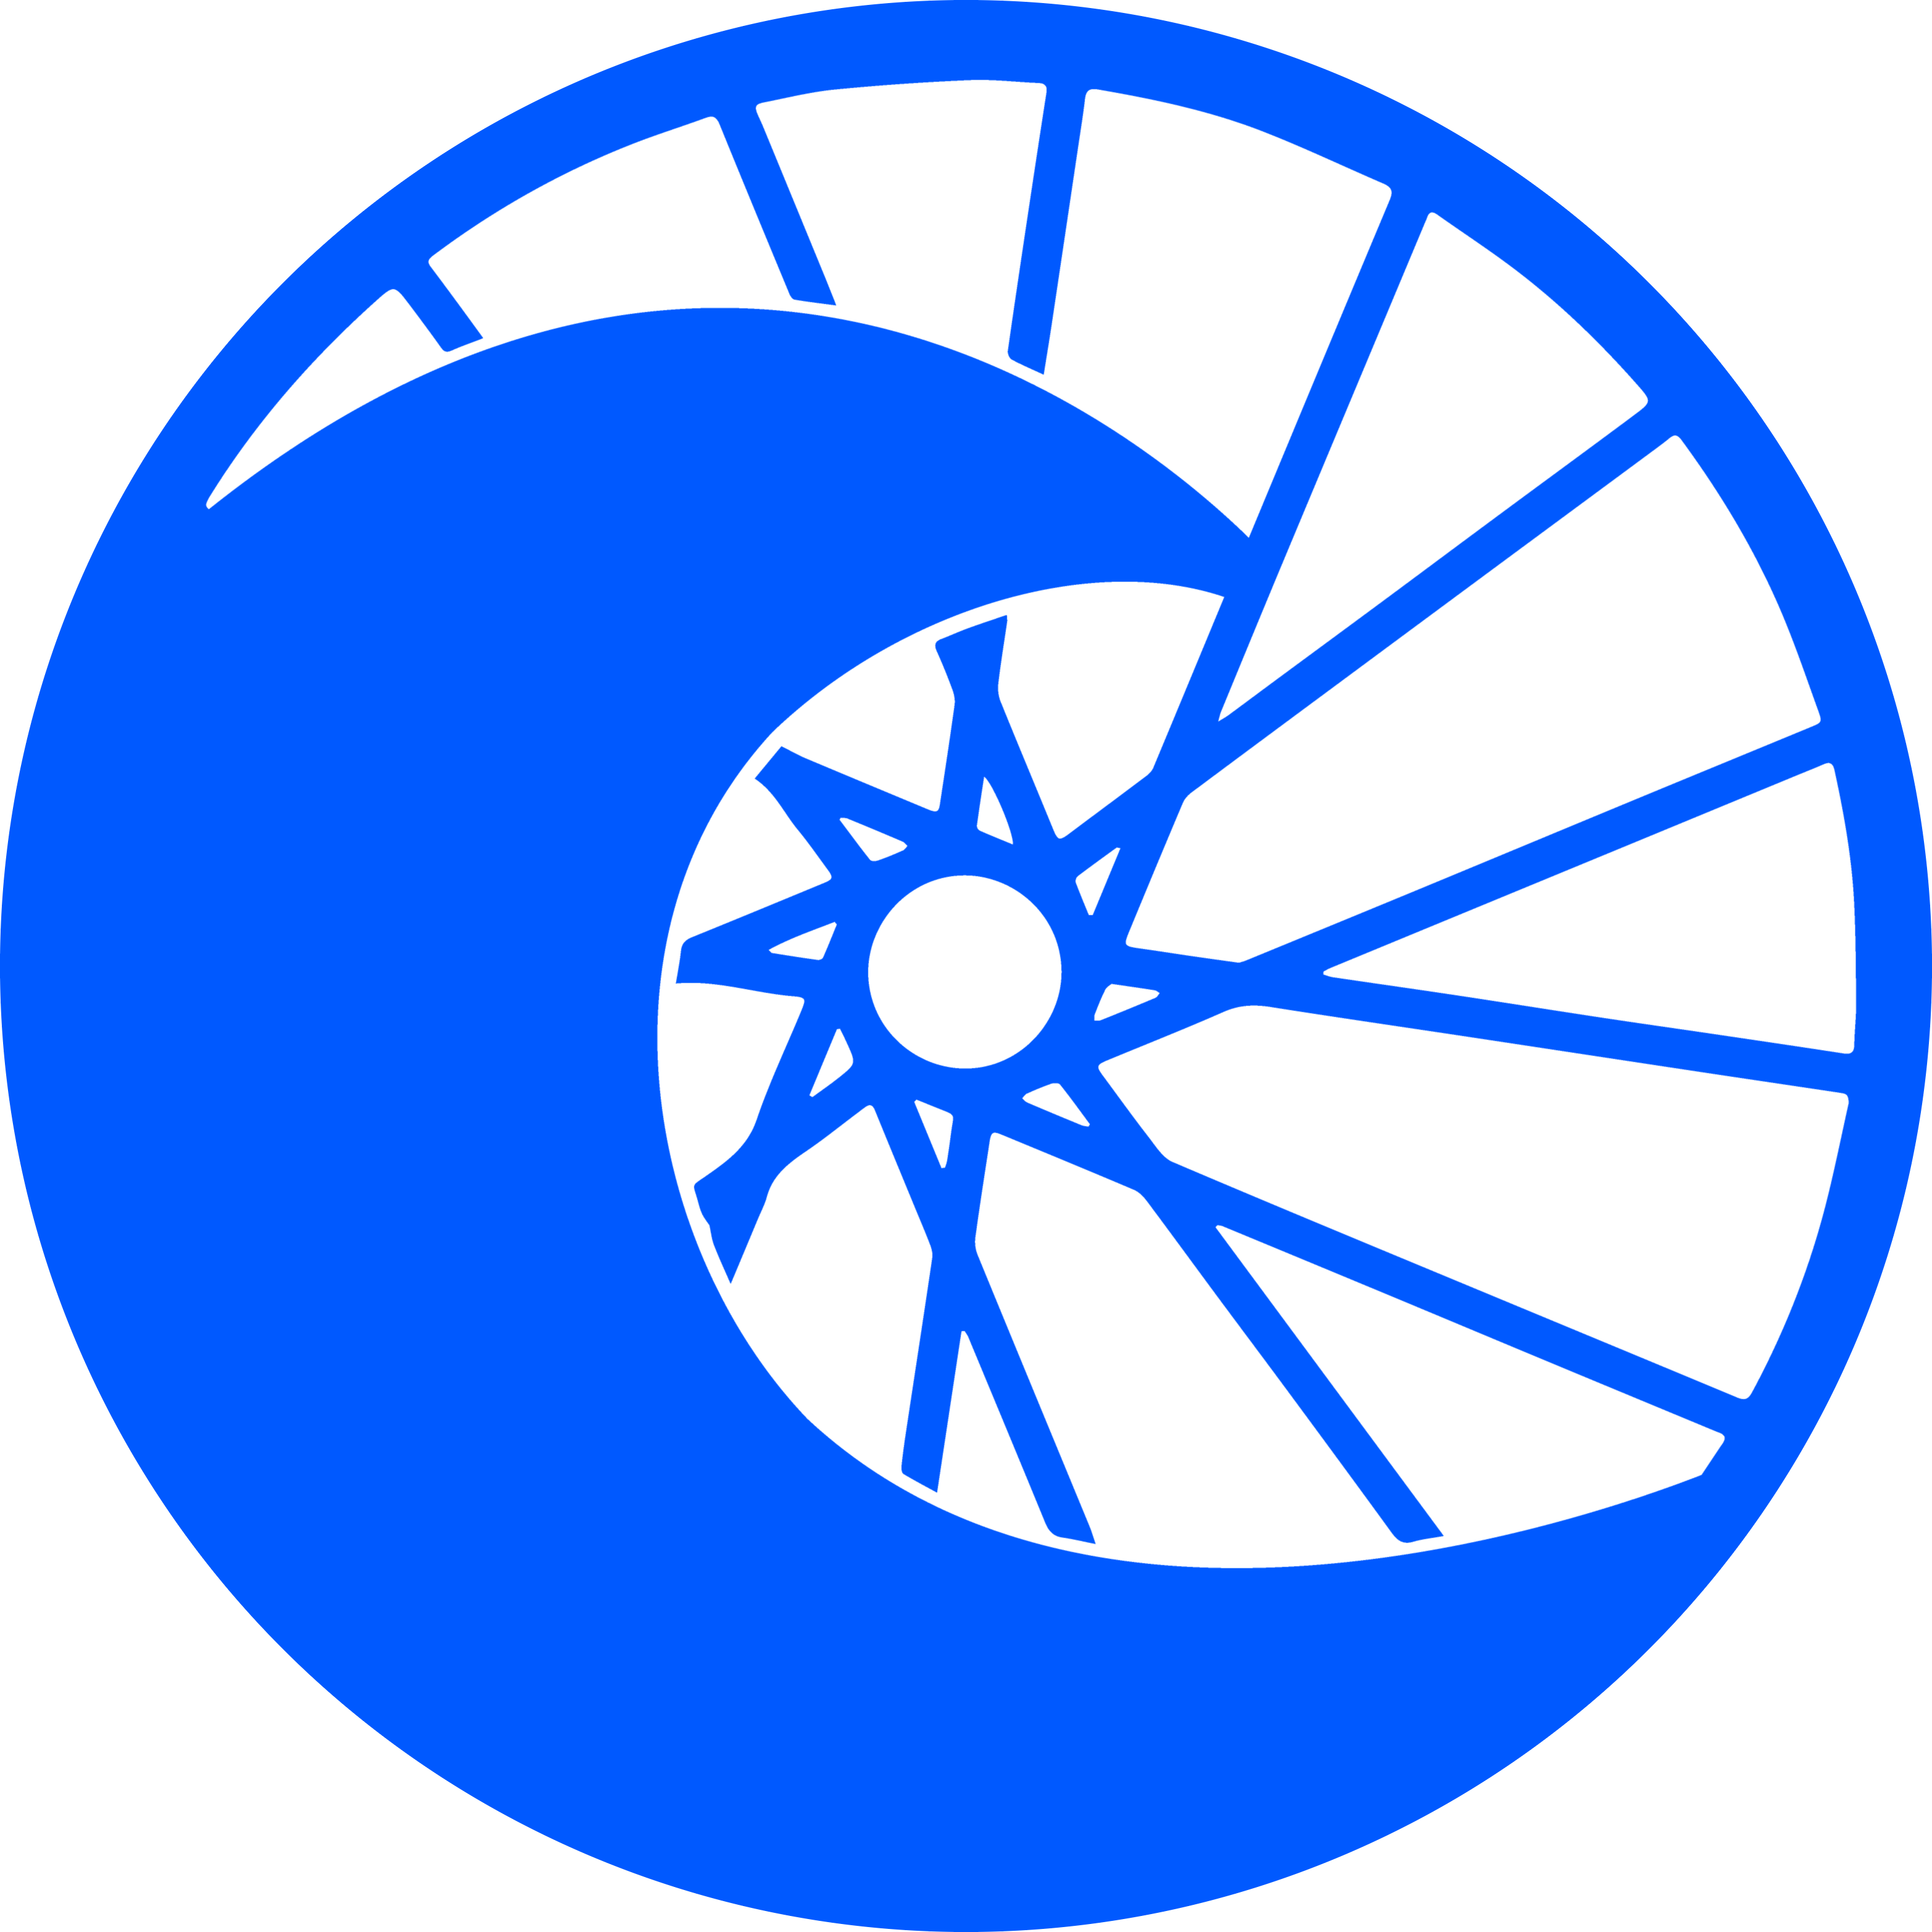 @WAVECYCLESTUDIO Profile Image | Linktree